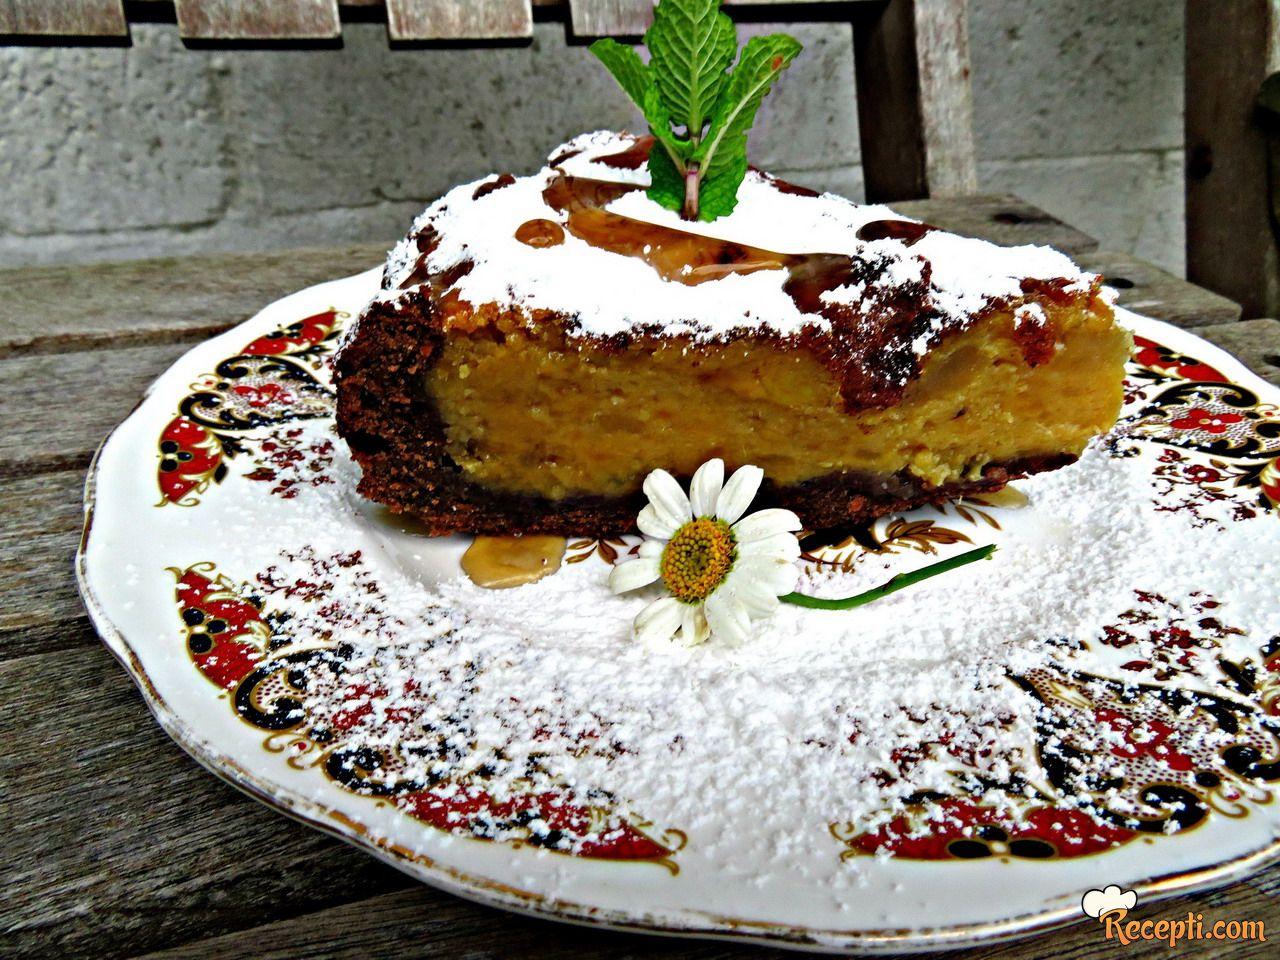 Kolač sa batatom (slatkim krompiro)